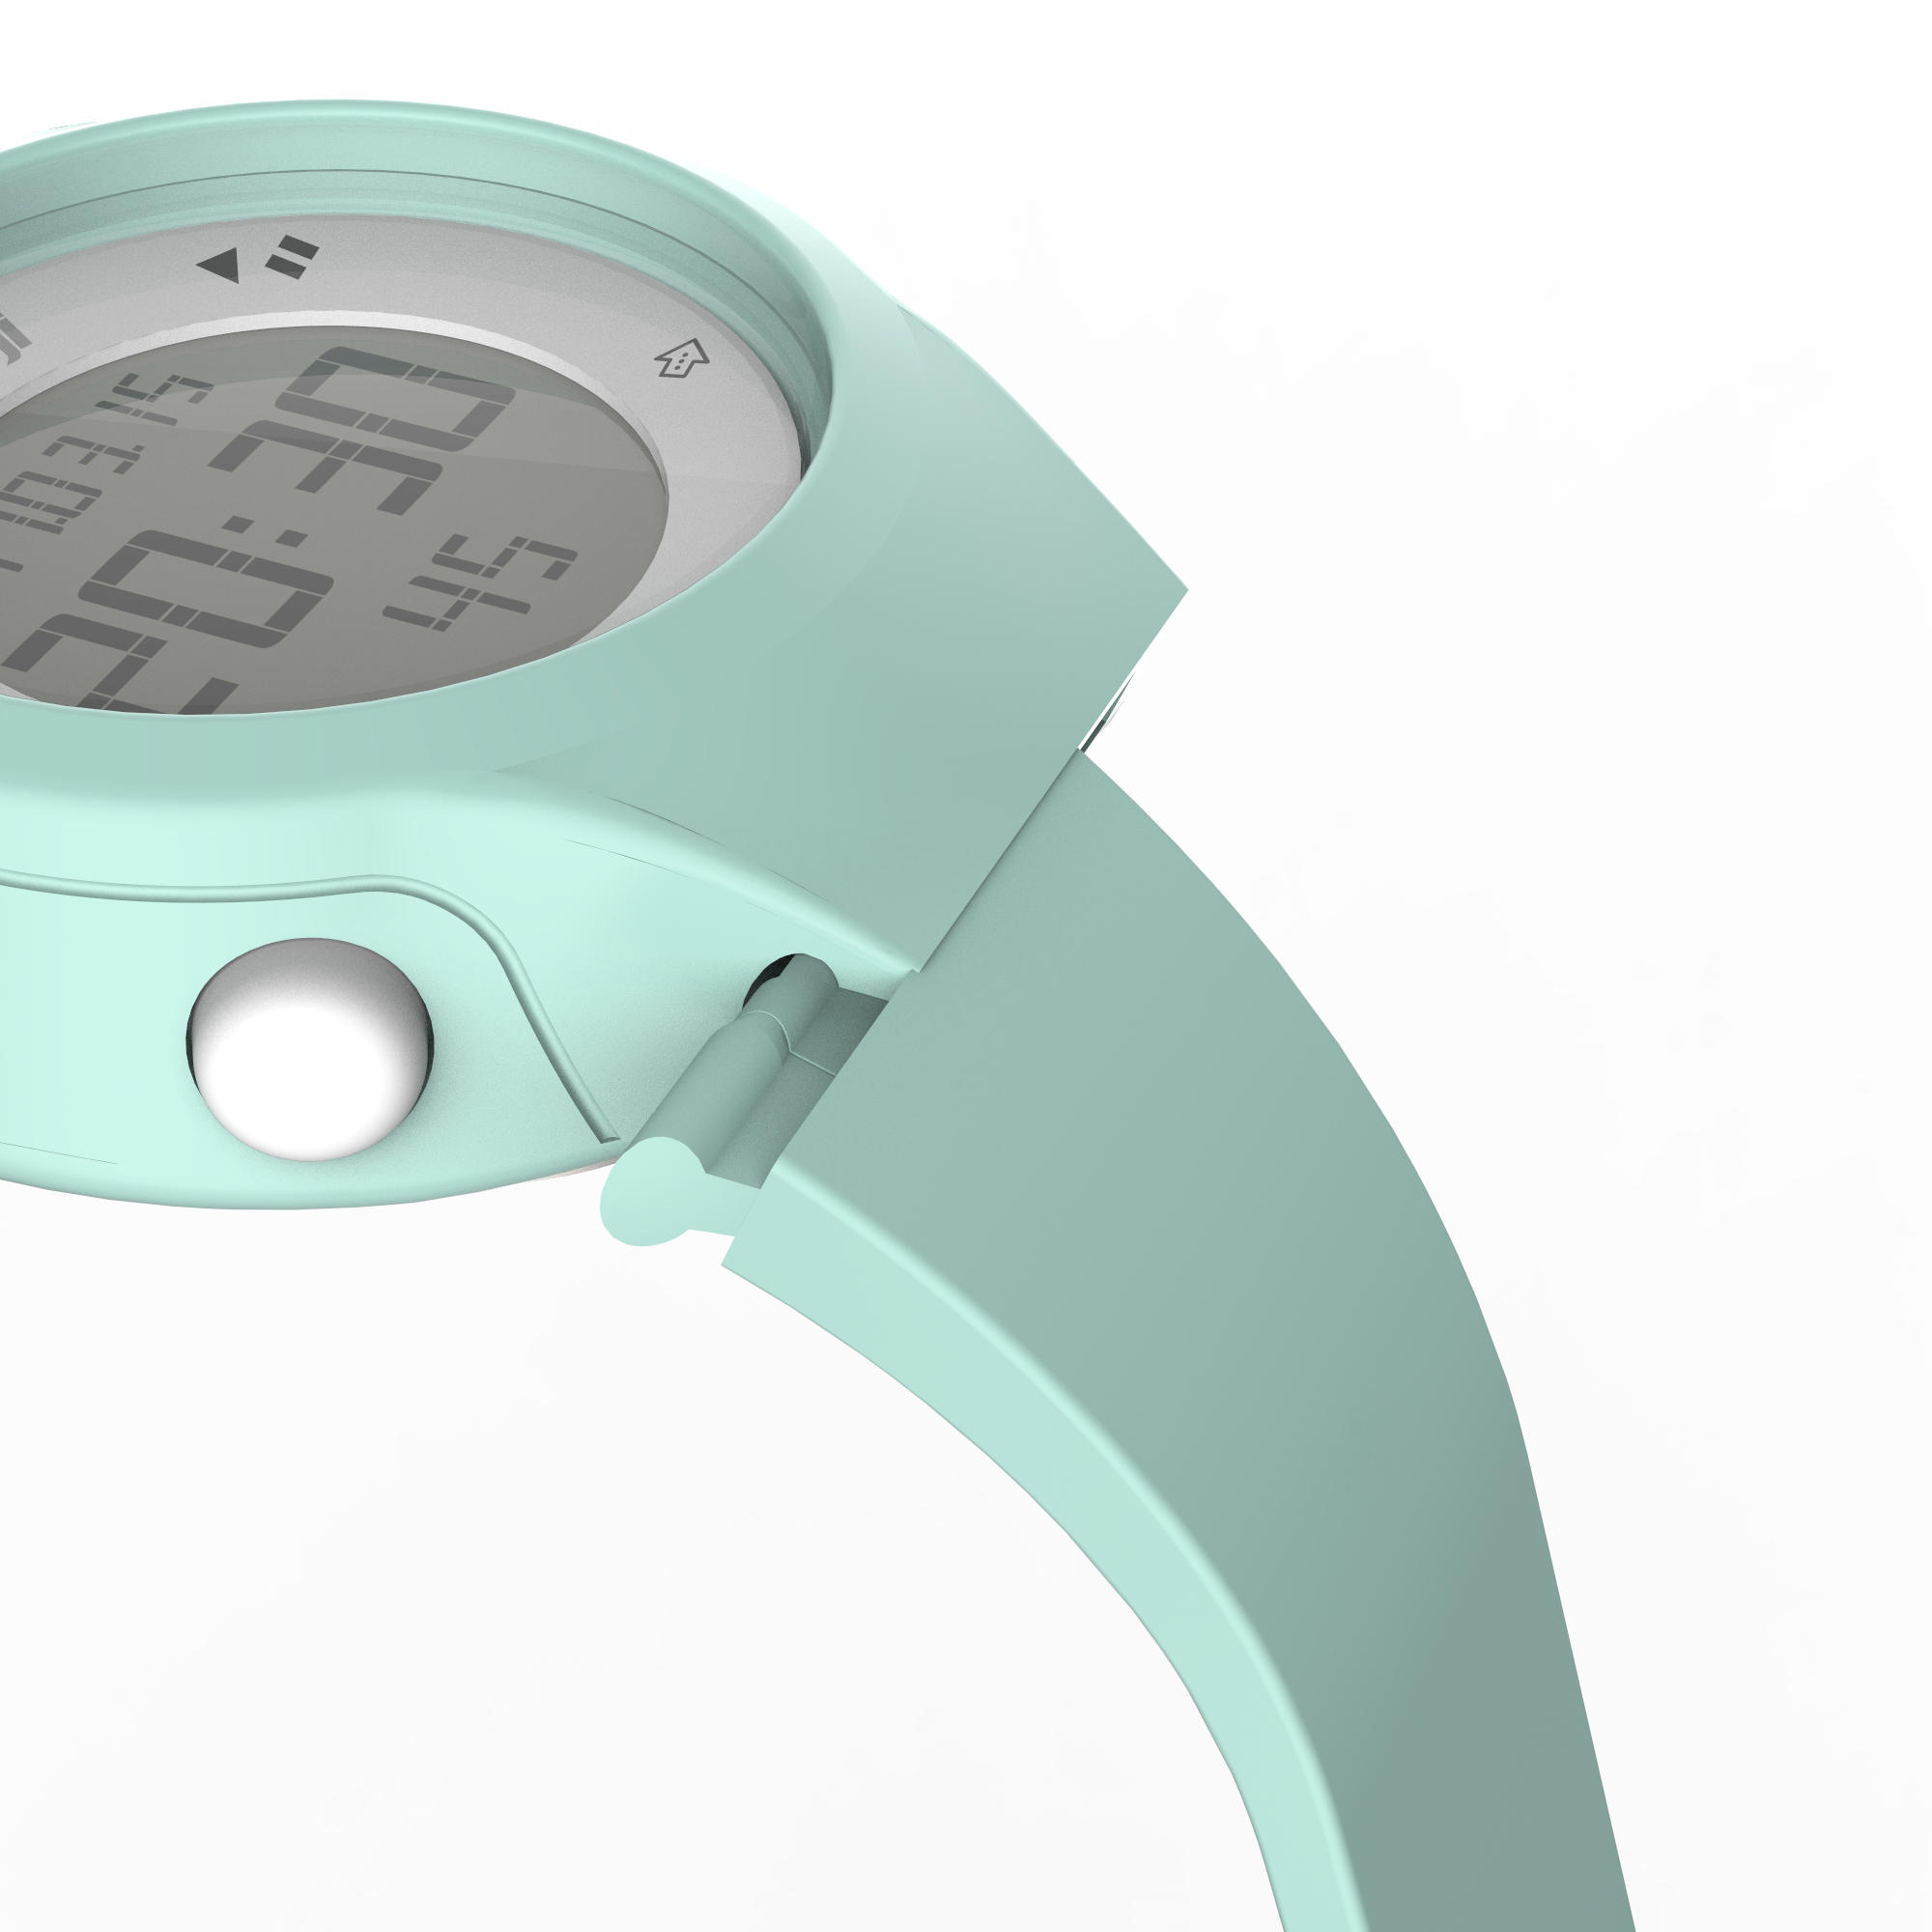 47376b660b5d Reloj digital de deporte mujer y junior temporizador W500 S swip VERDE  PASTEL